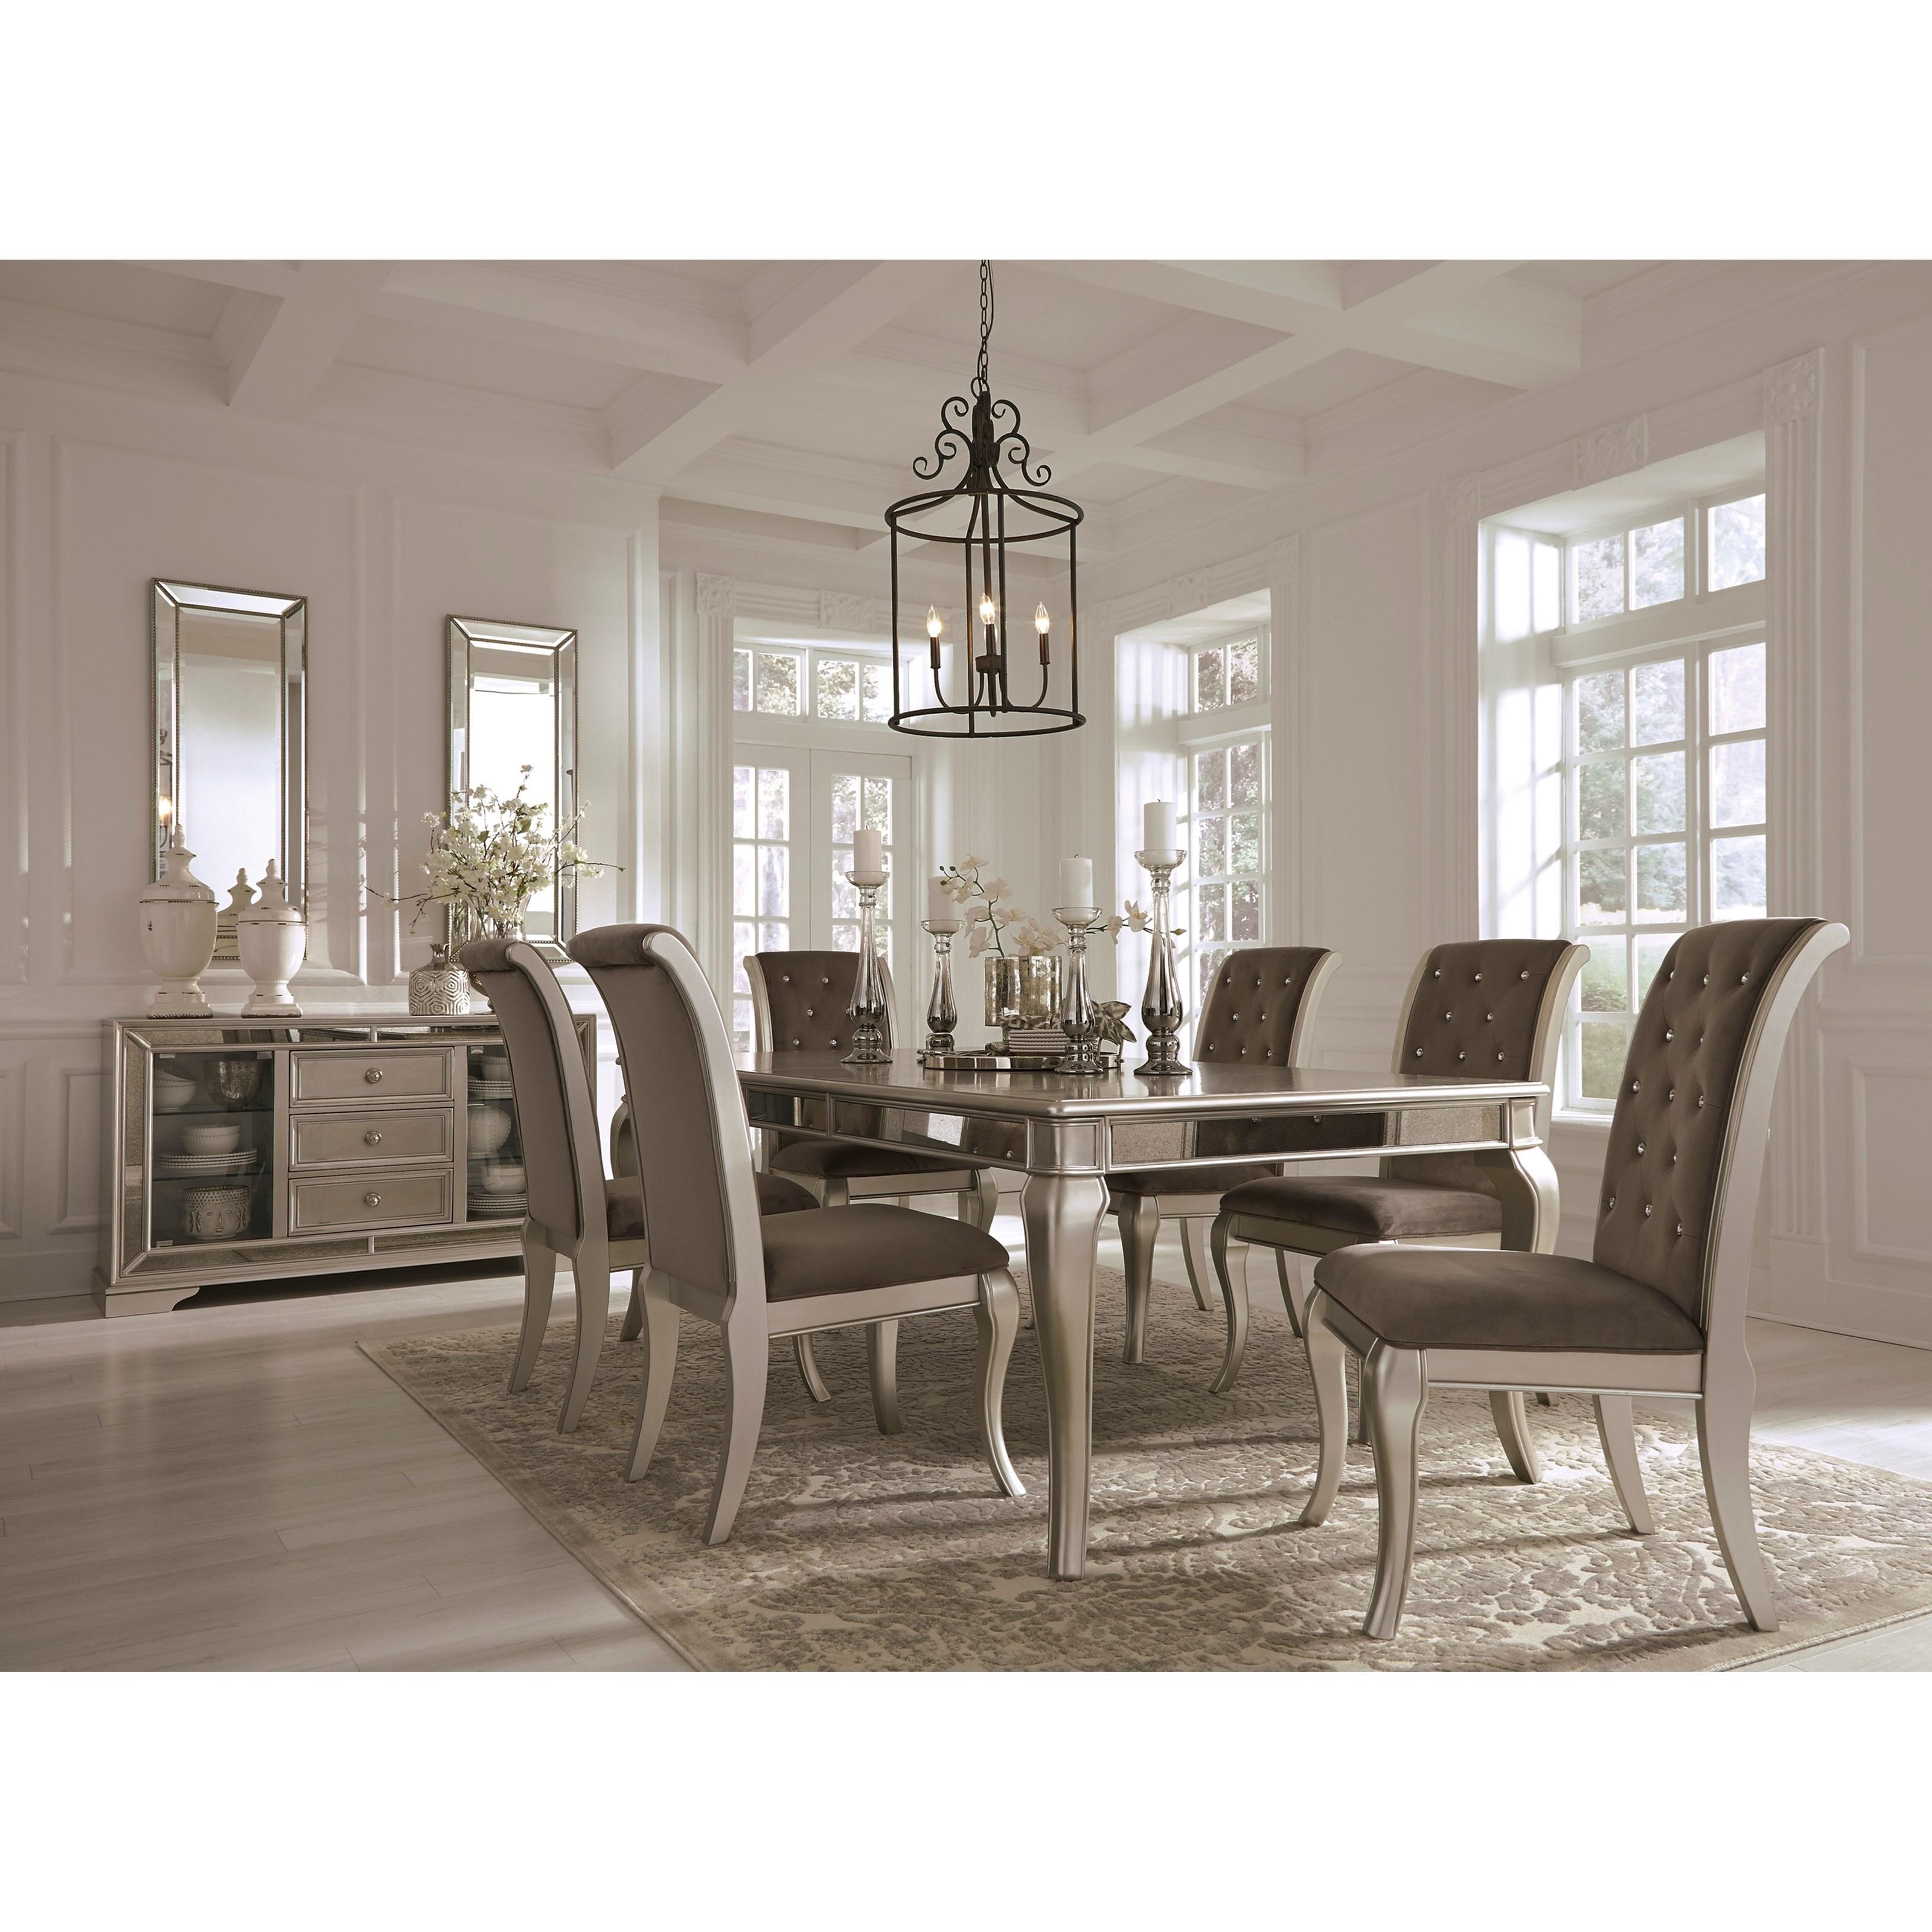 ... Signature Design By Ashley BirlannyRectangular Dining Room Extension  Table ...